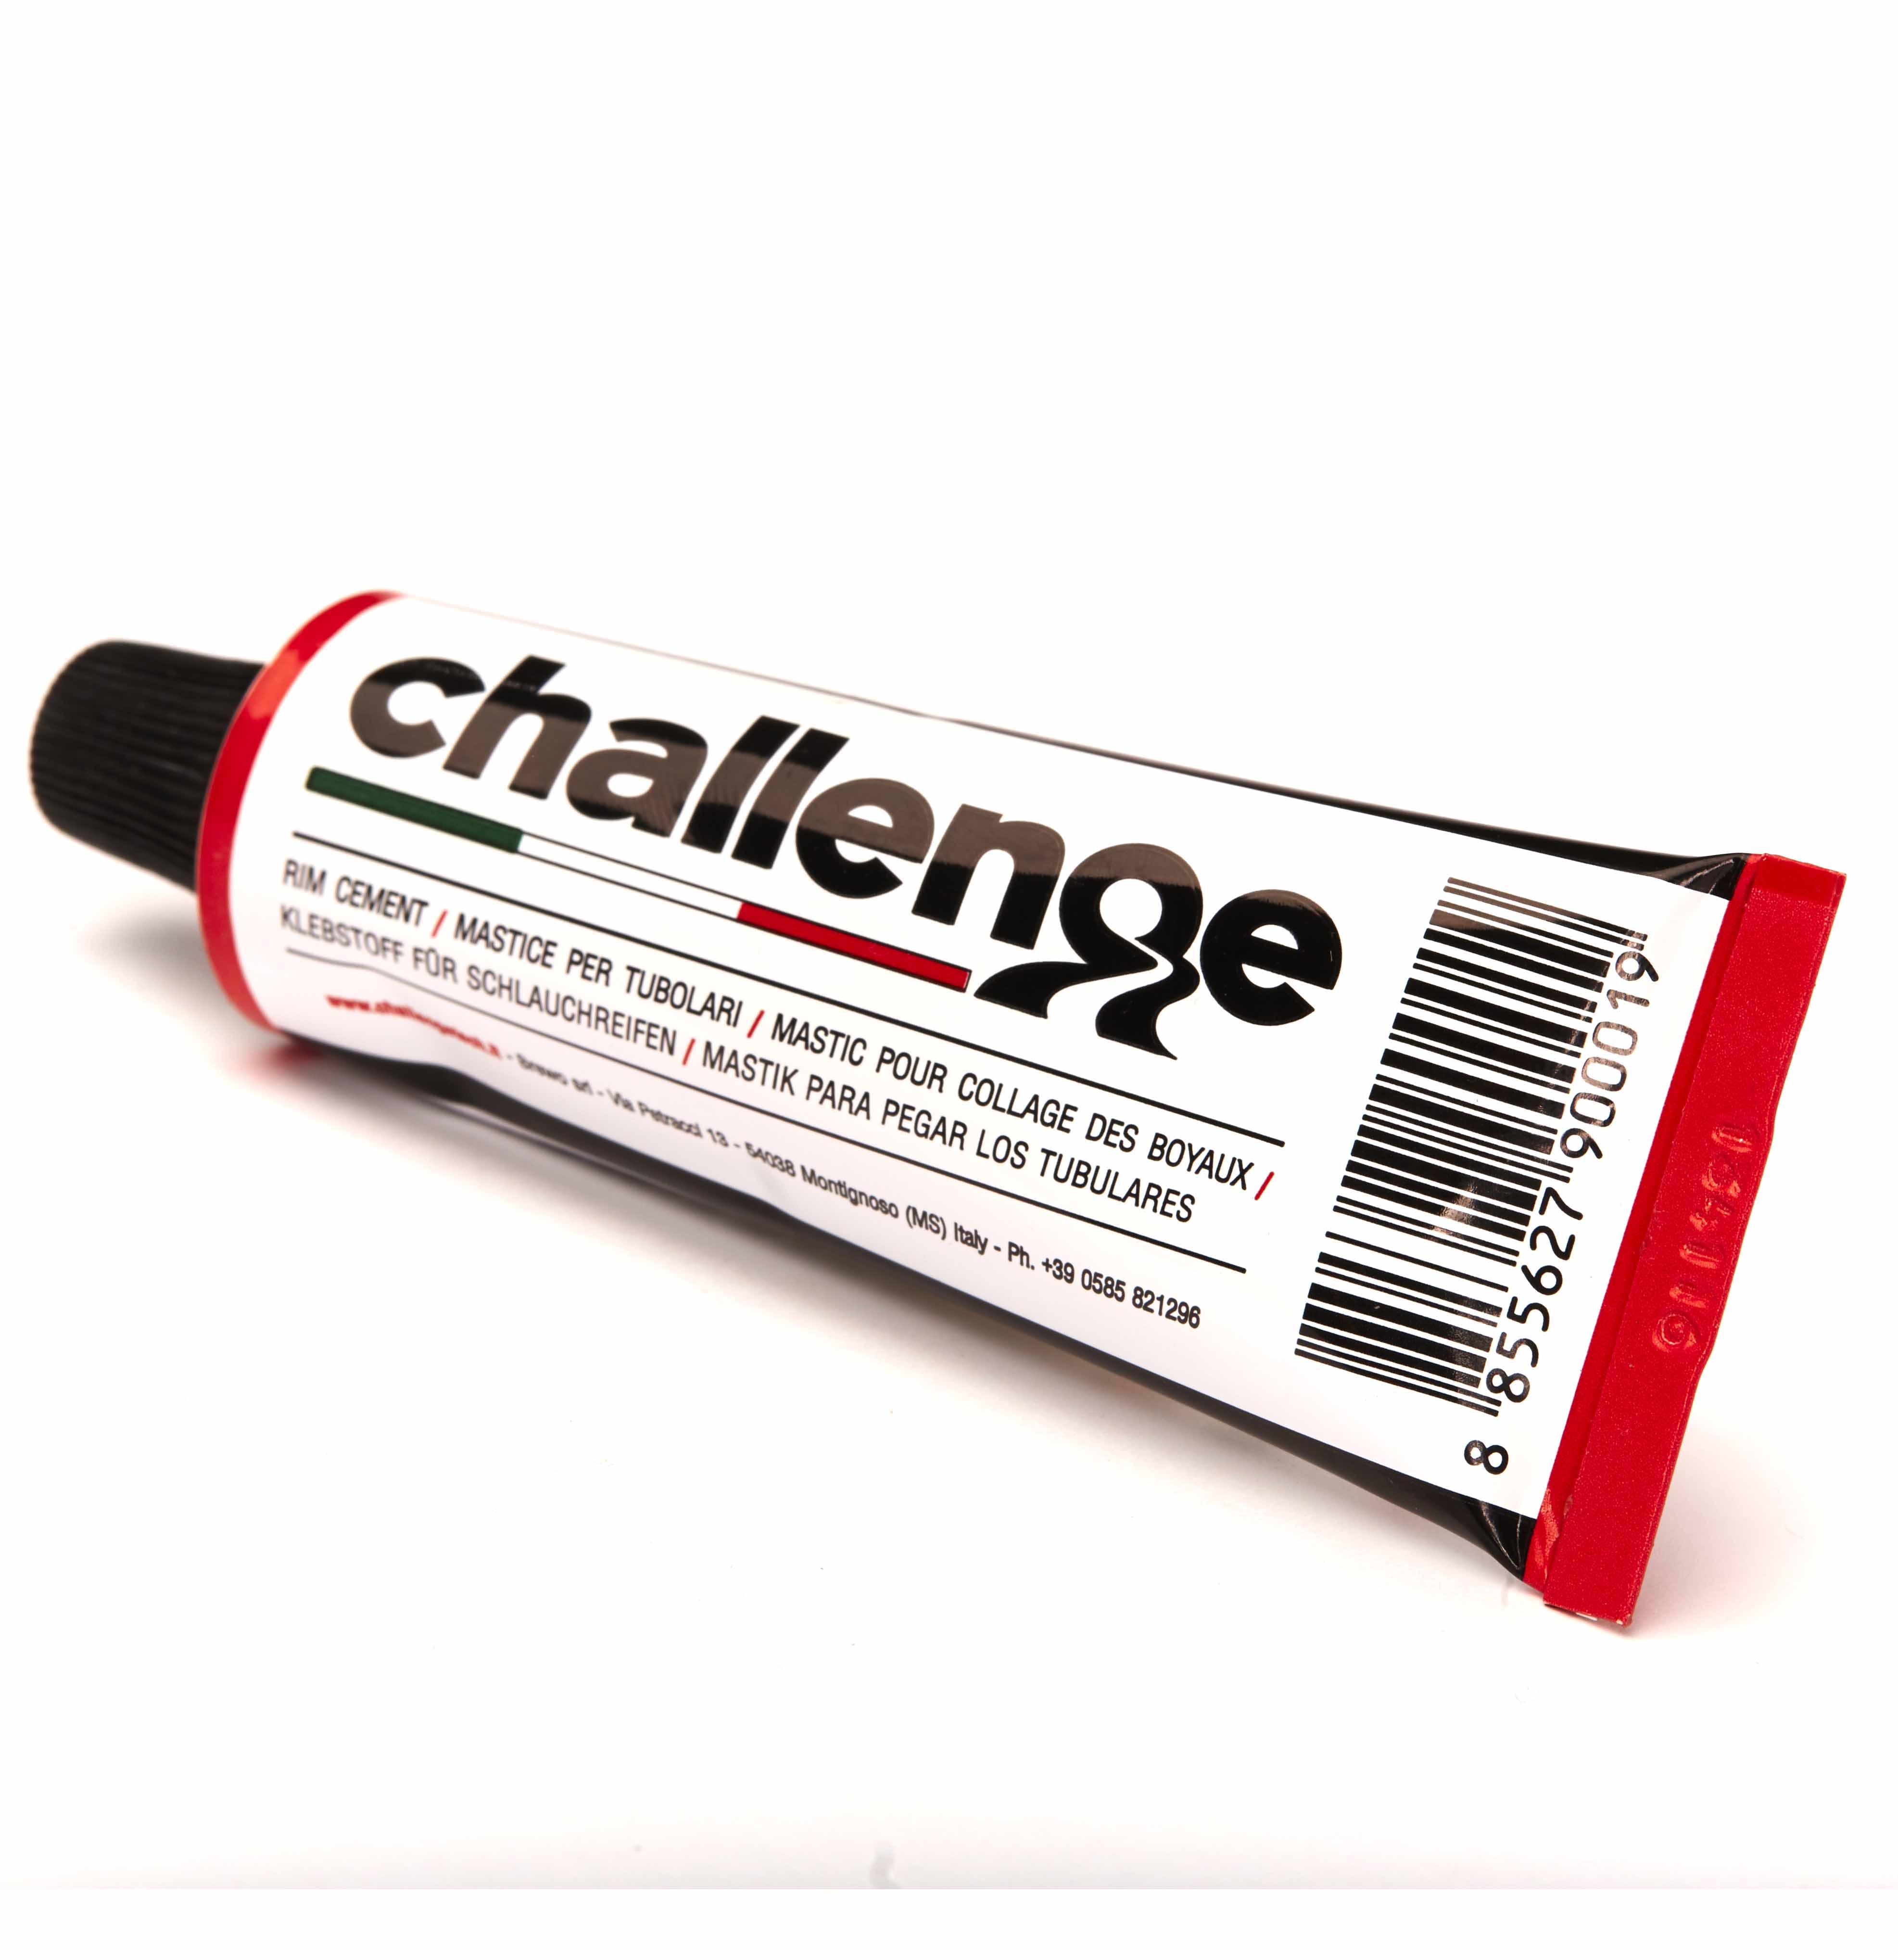 tubular kit challenge tube 25g